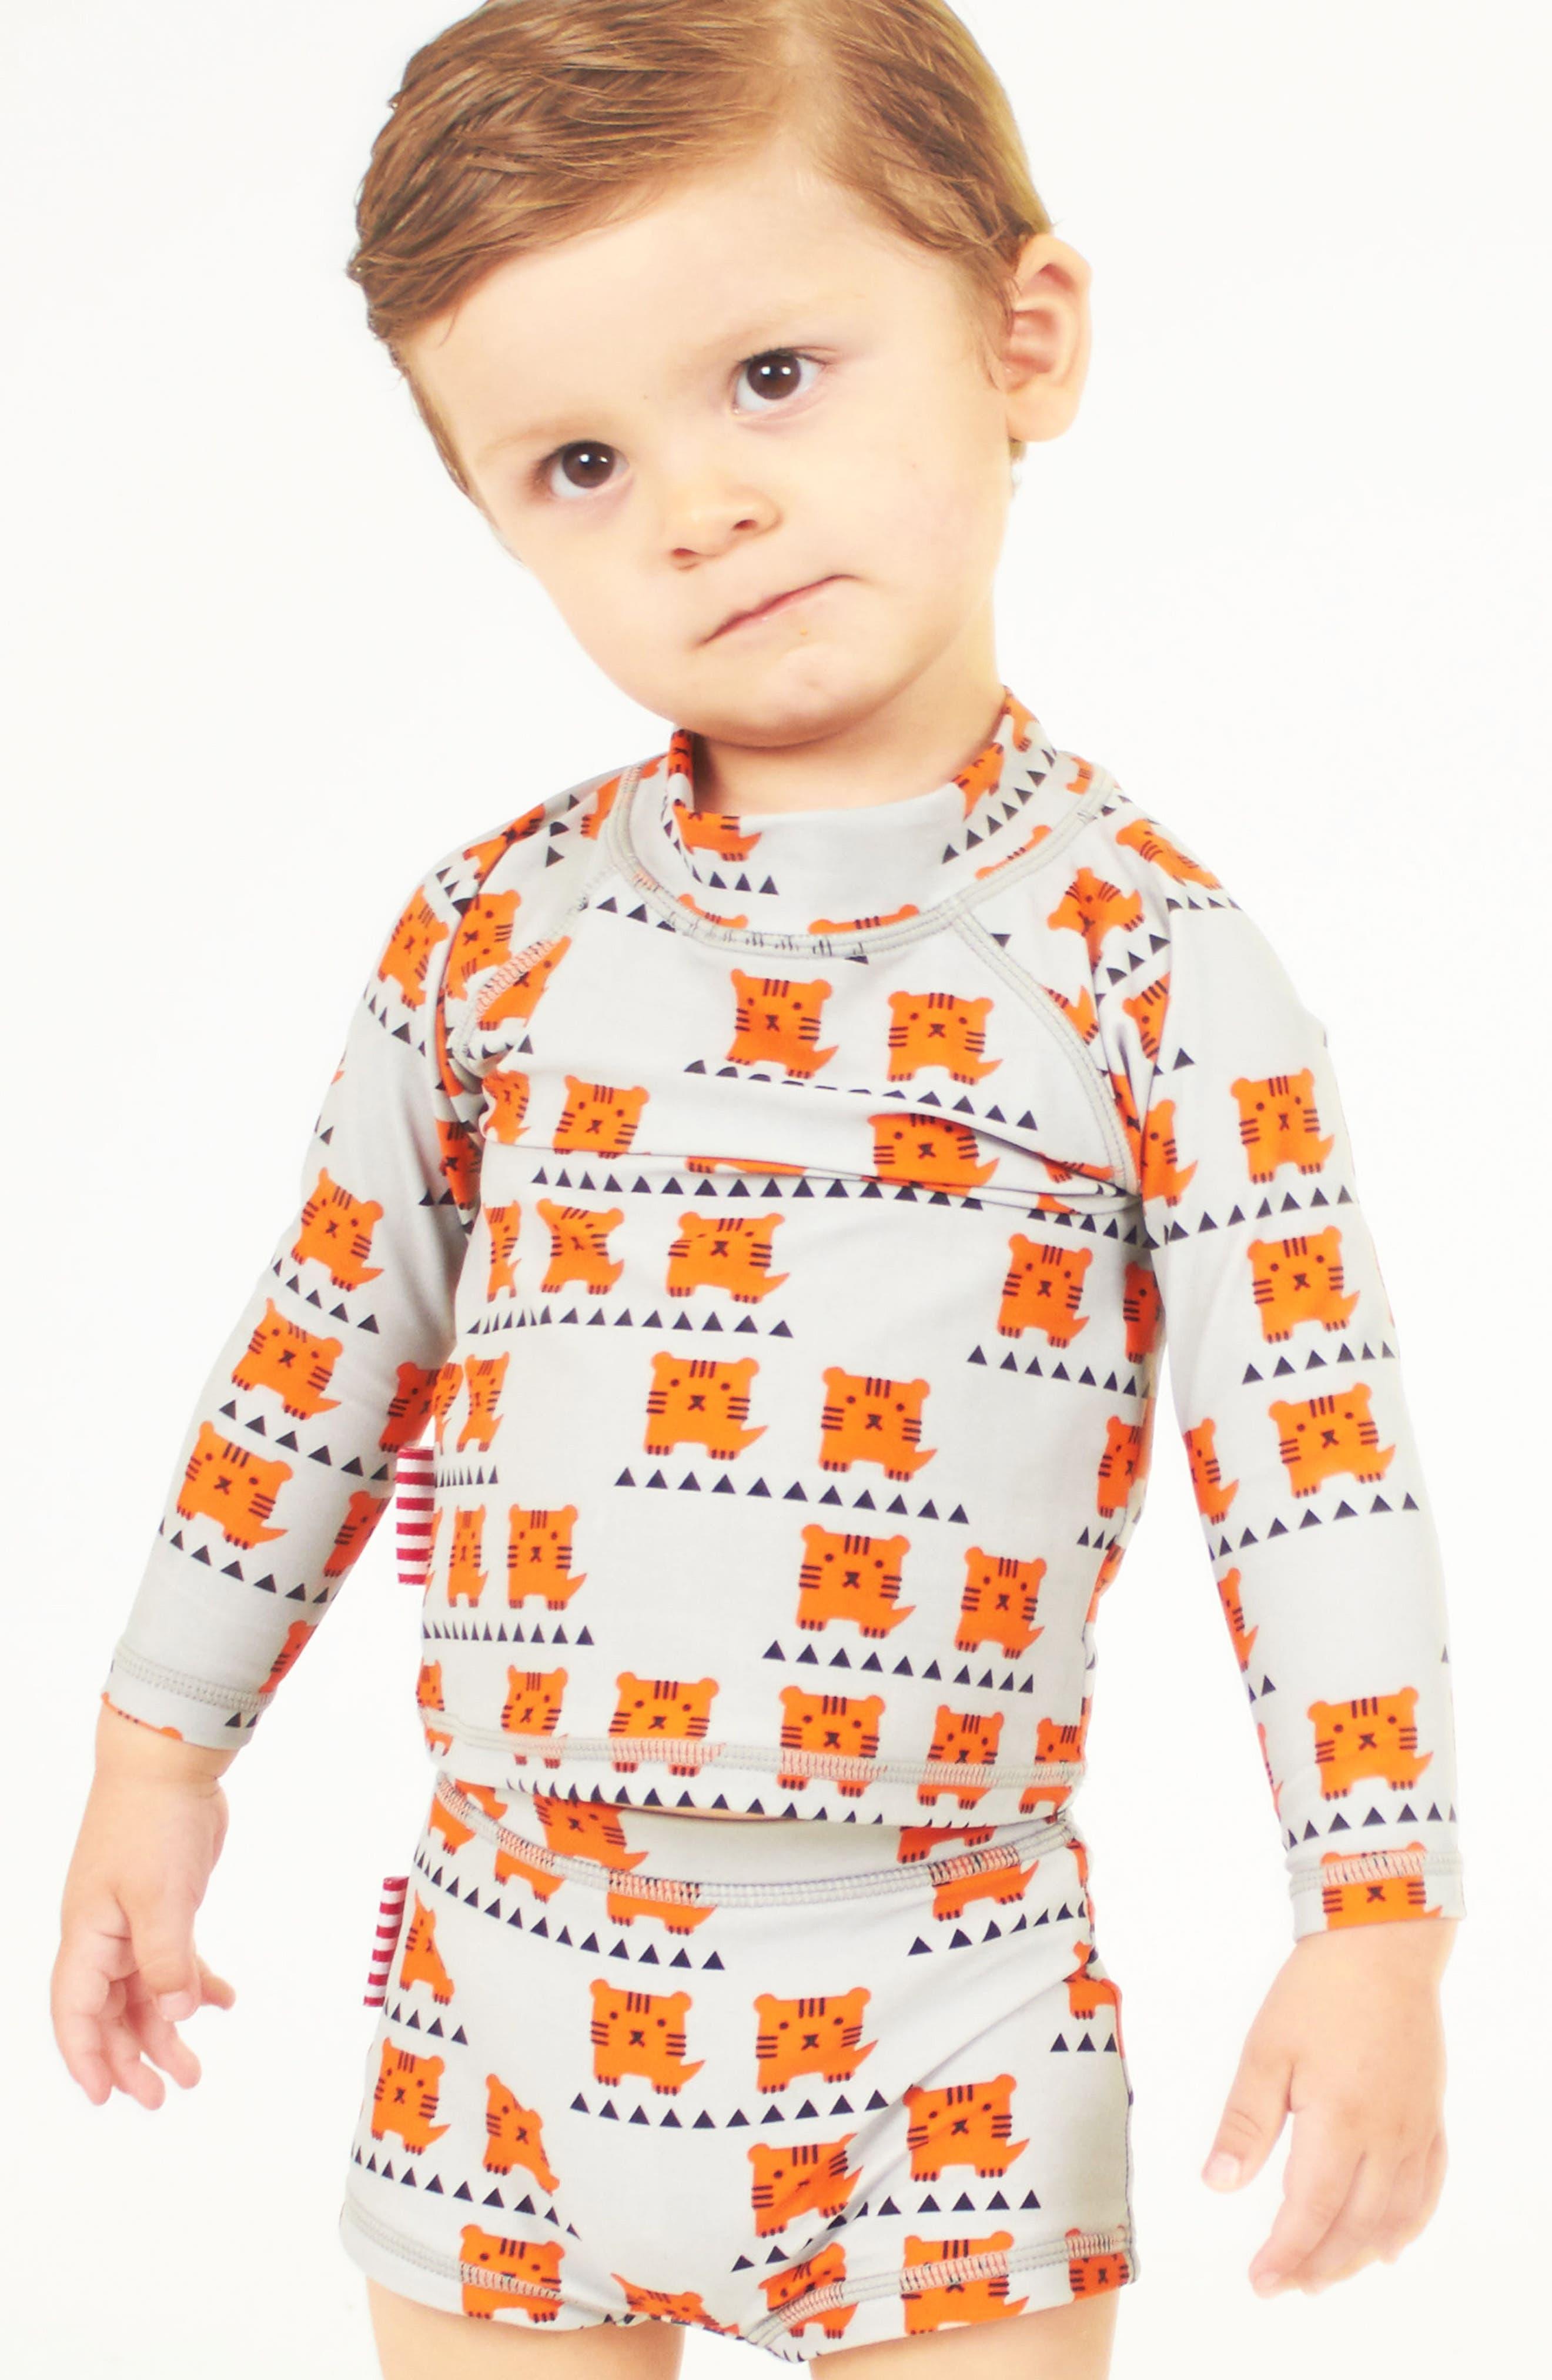 Alternate Image 3  - SOOKIbaby Cub In The Hub Two-Piece Rashguard Swimsuit (Baby Boys)